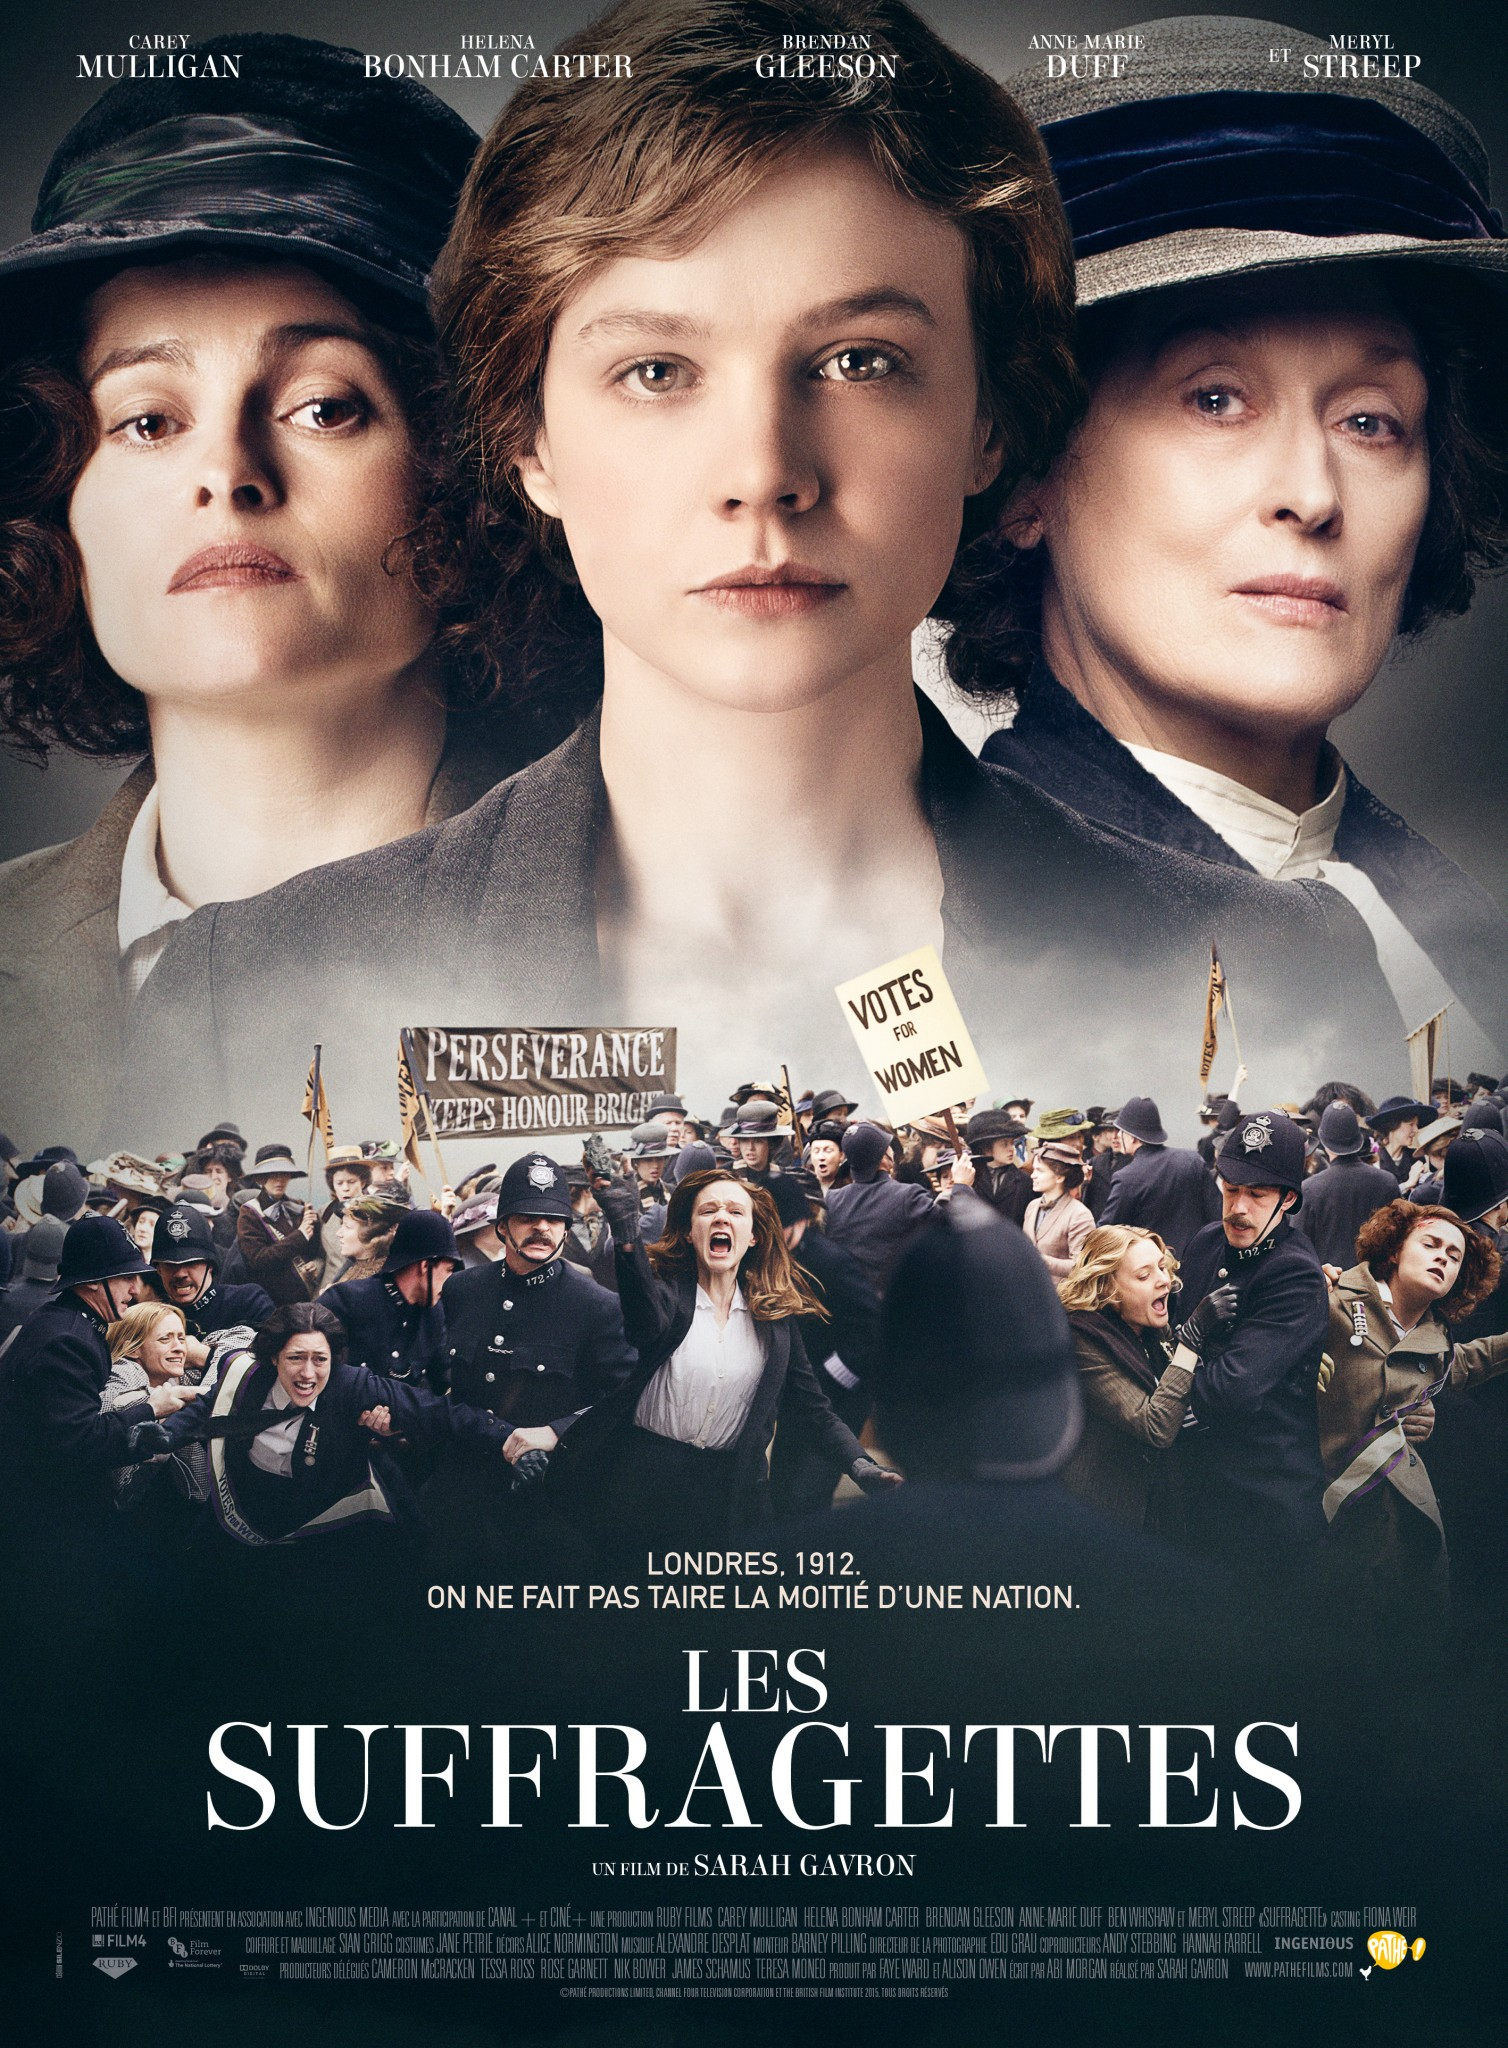 <i>Les Suffragettes</i> (2015), quand les femmes se font entendre ! 5 image